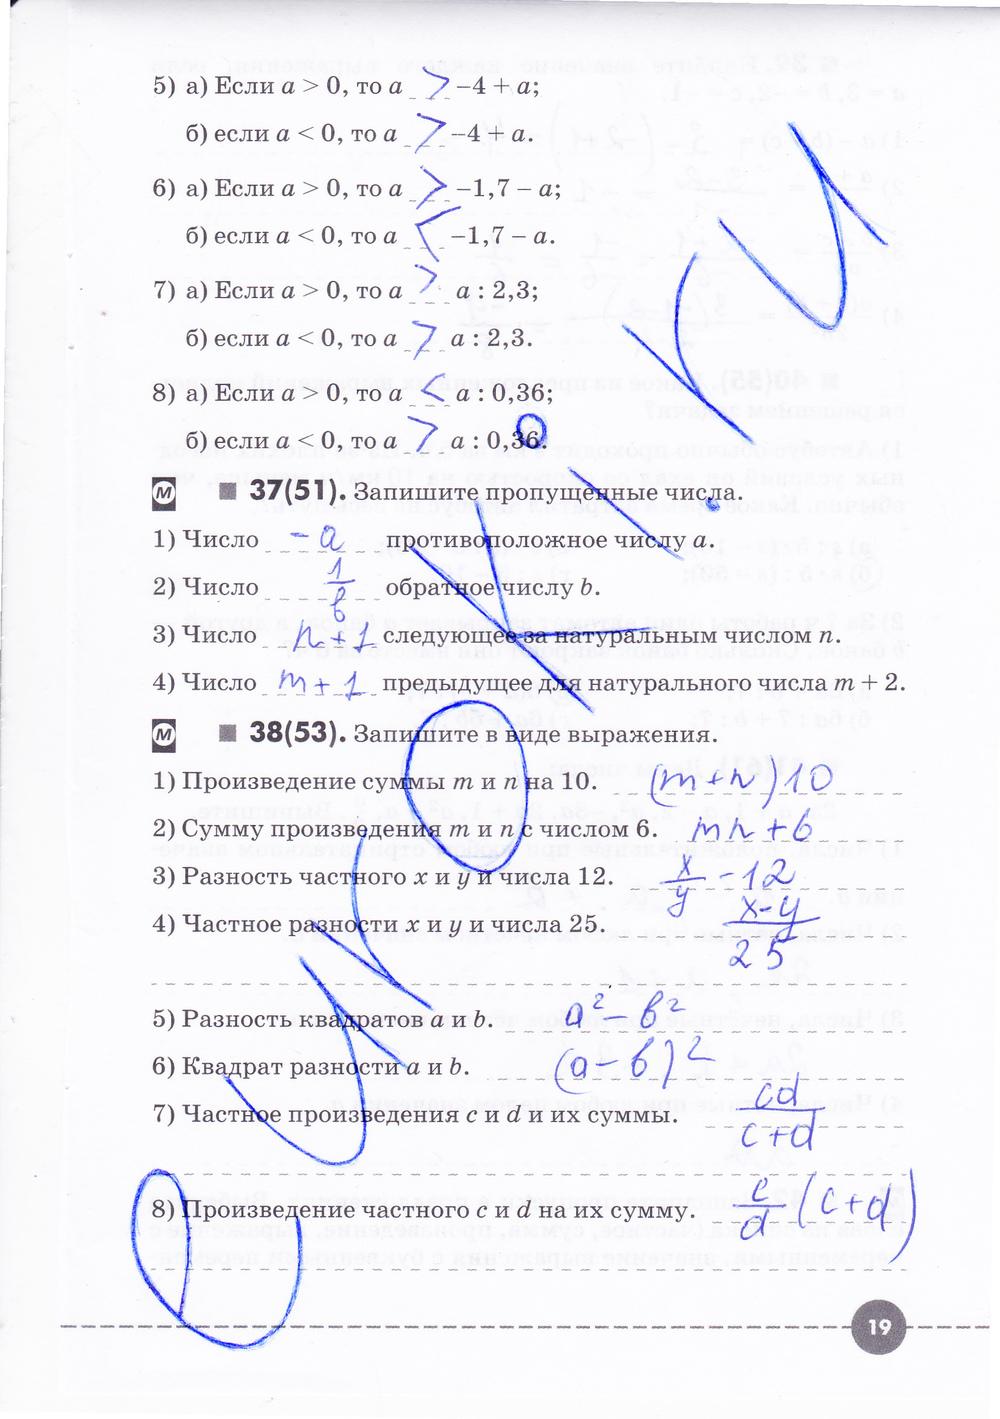 Гдз алгебра 7 класс муравин рабочая тетрадь